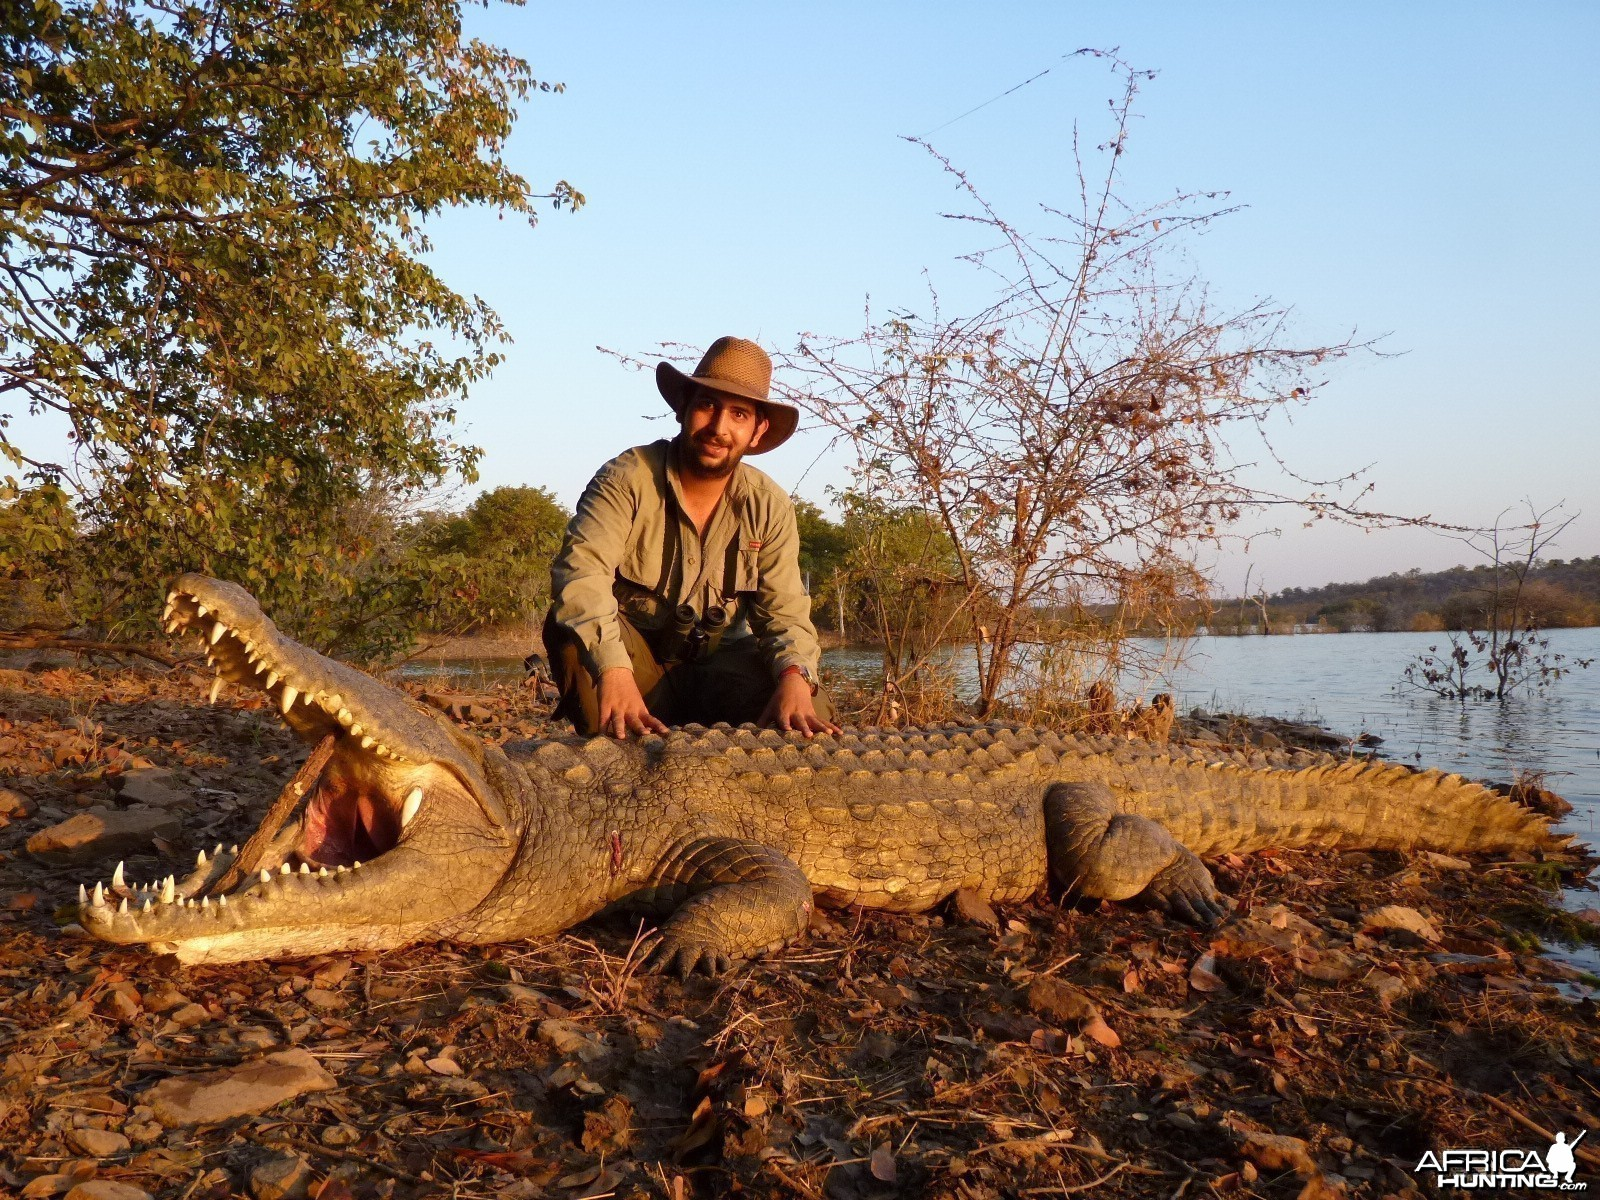 Hunting Crocodile with Wintershoek Johnny Vivier Safaris in SA